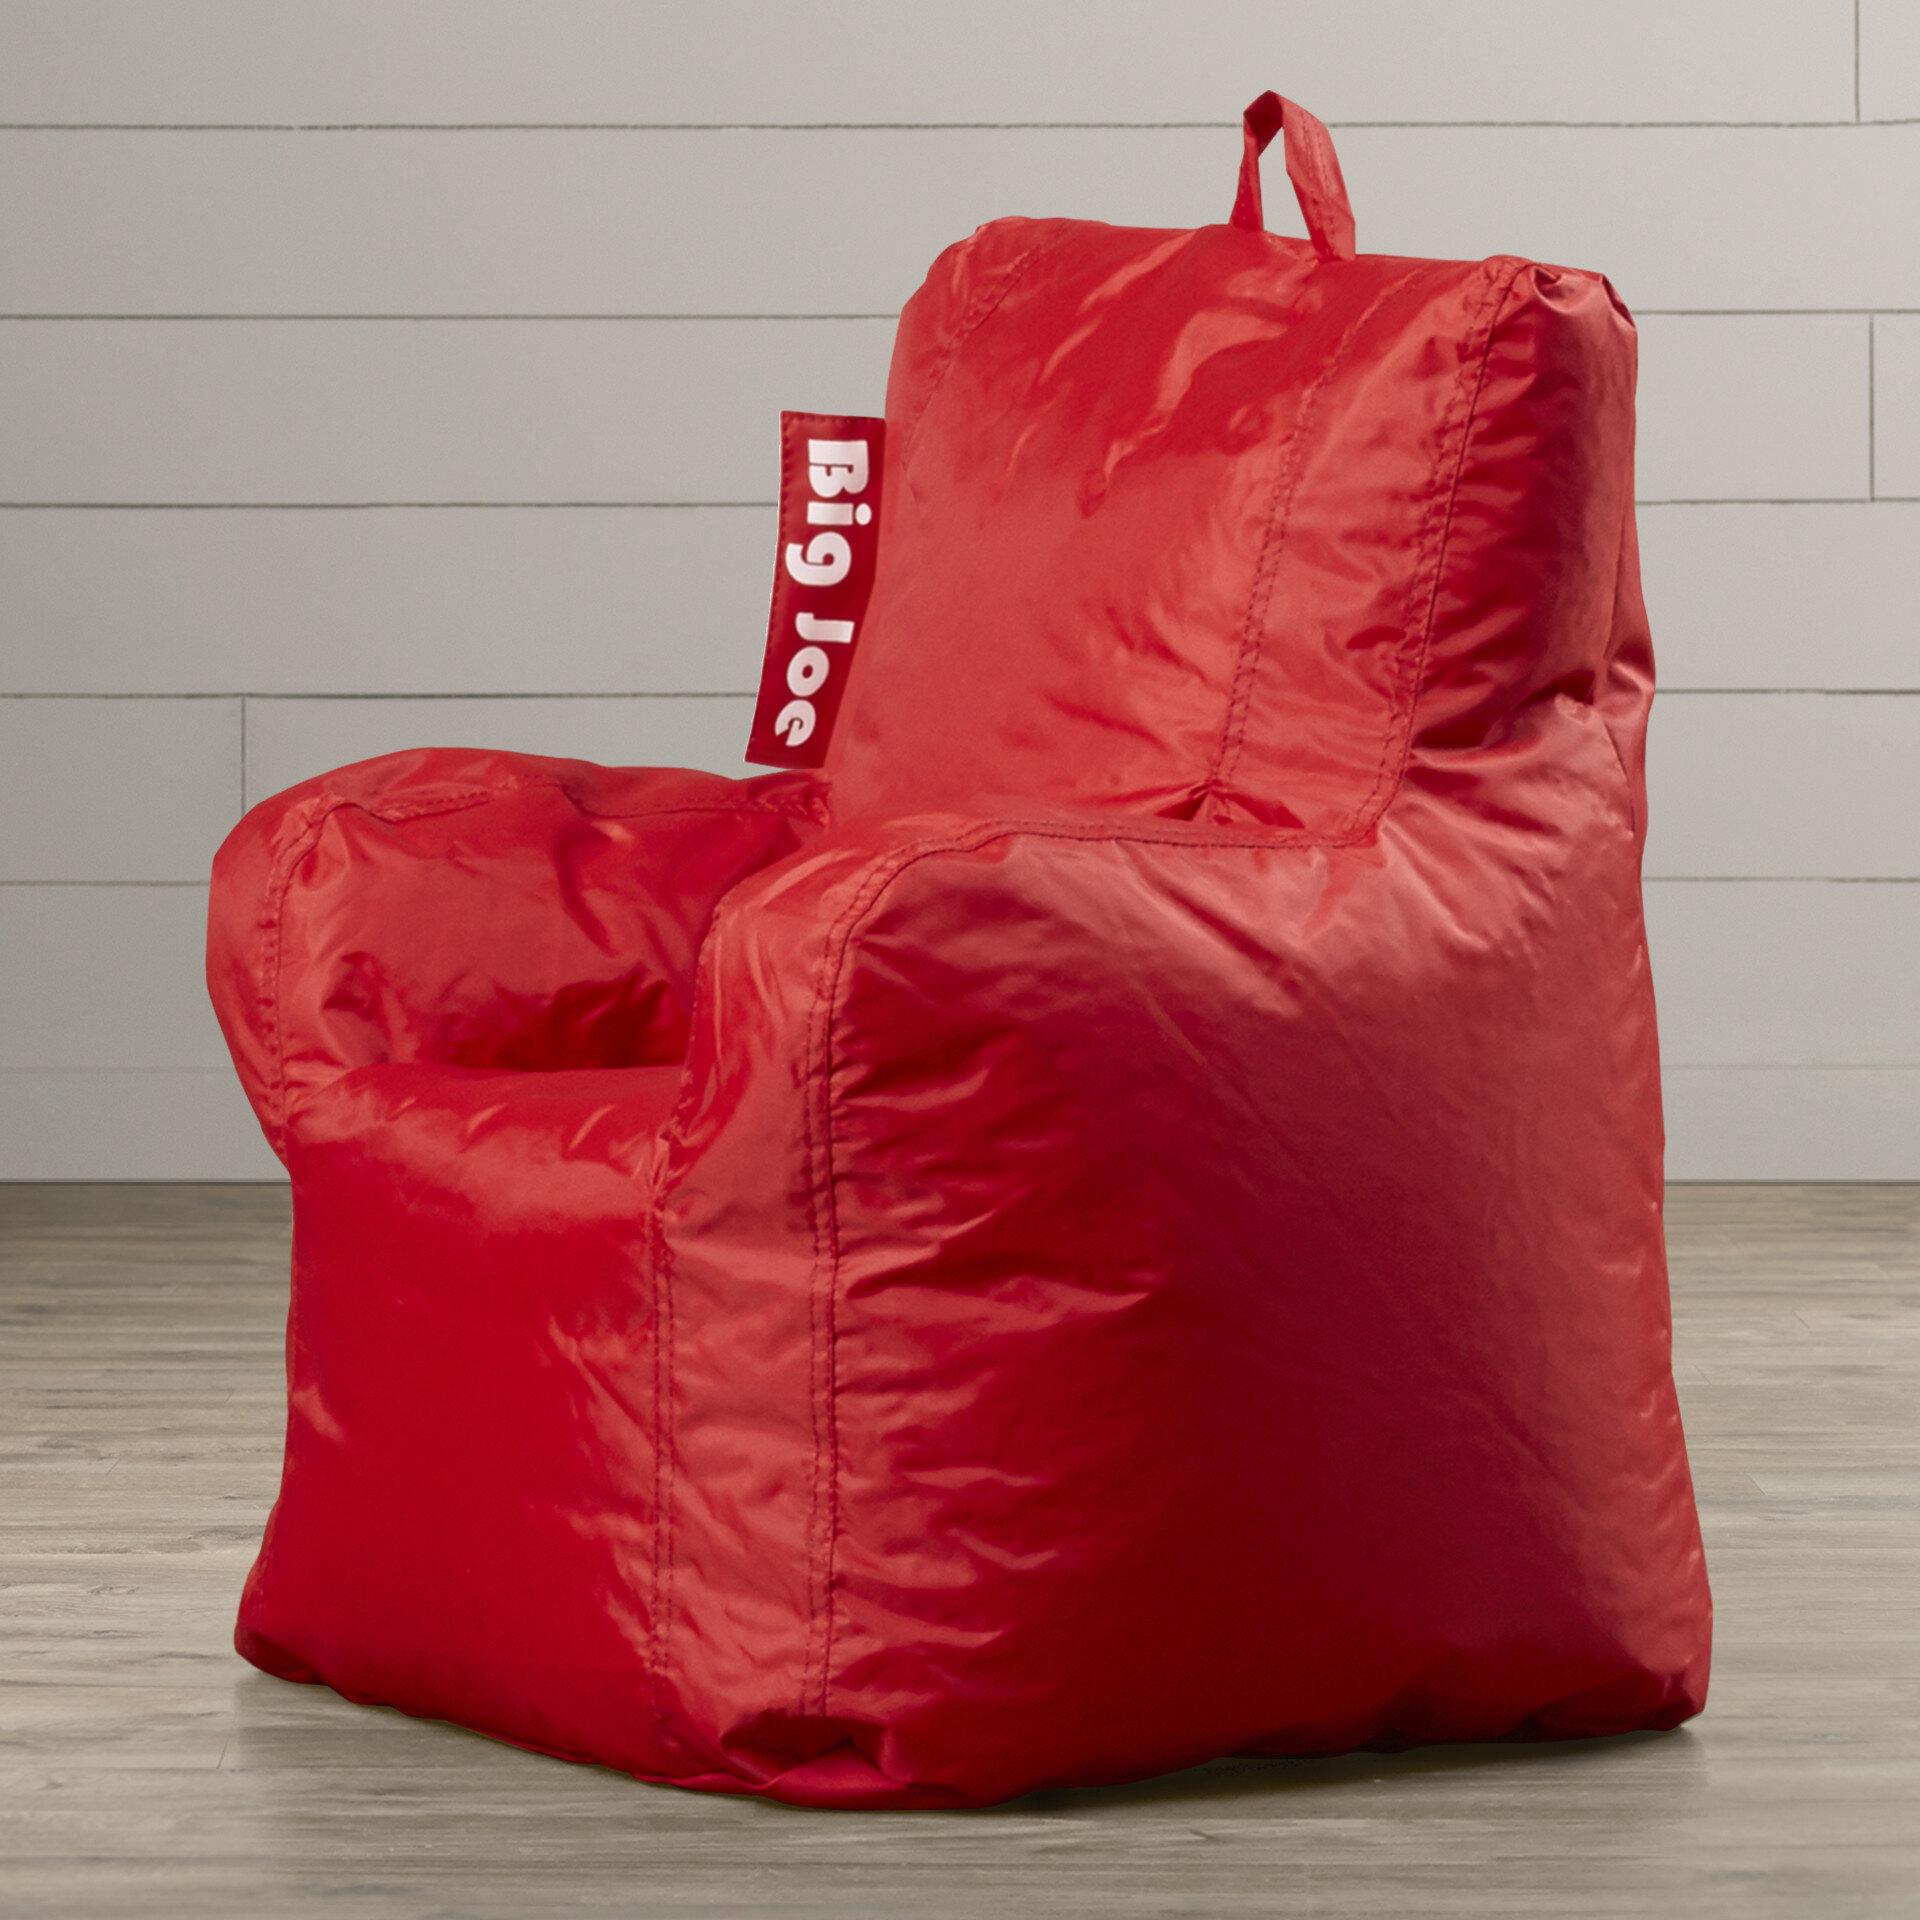 Terrific Big Joe Cuddle S Bean Bag Lounger Beatyapartments Chair Design Images Beatyapartmentscom